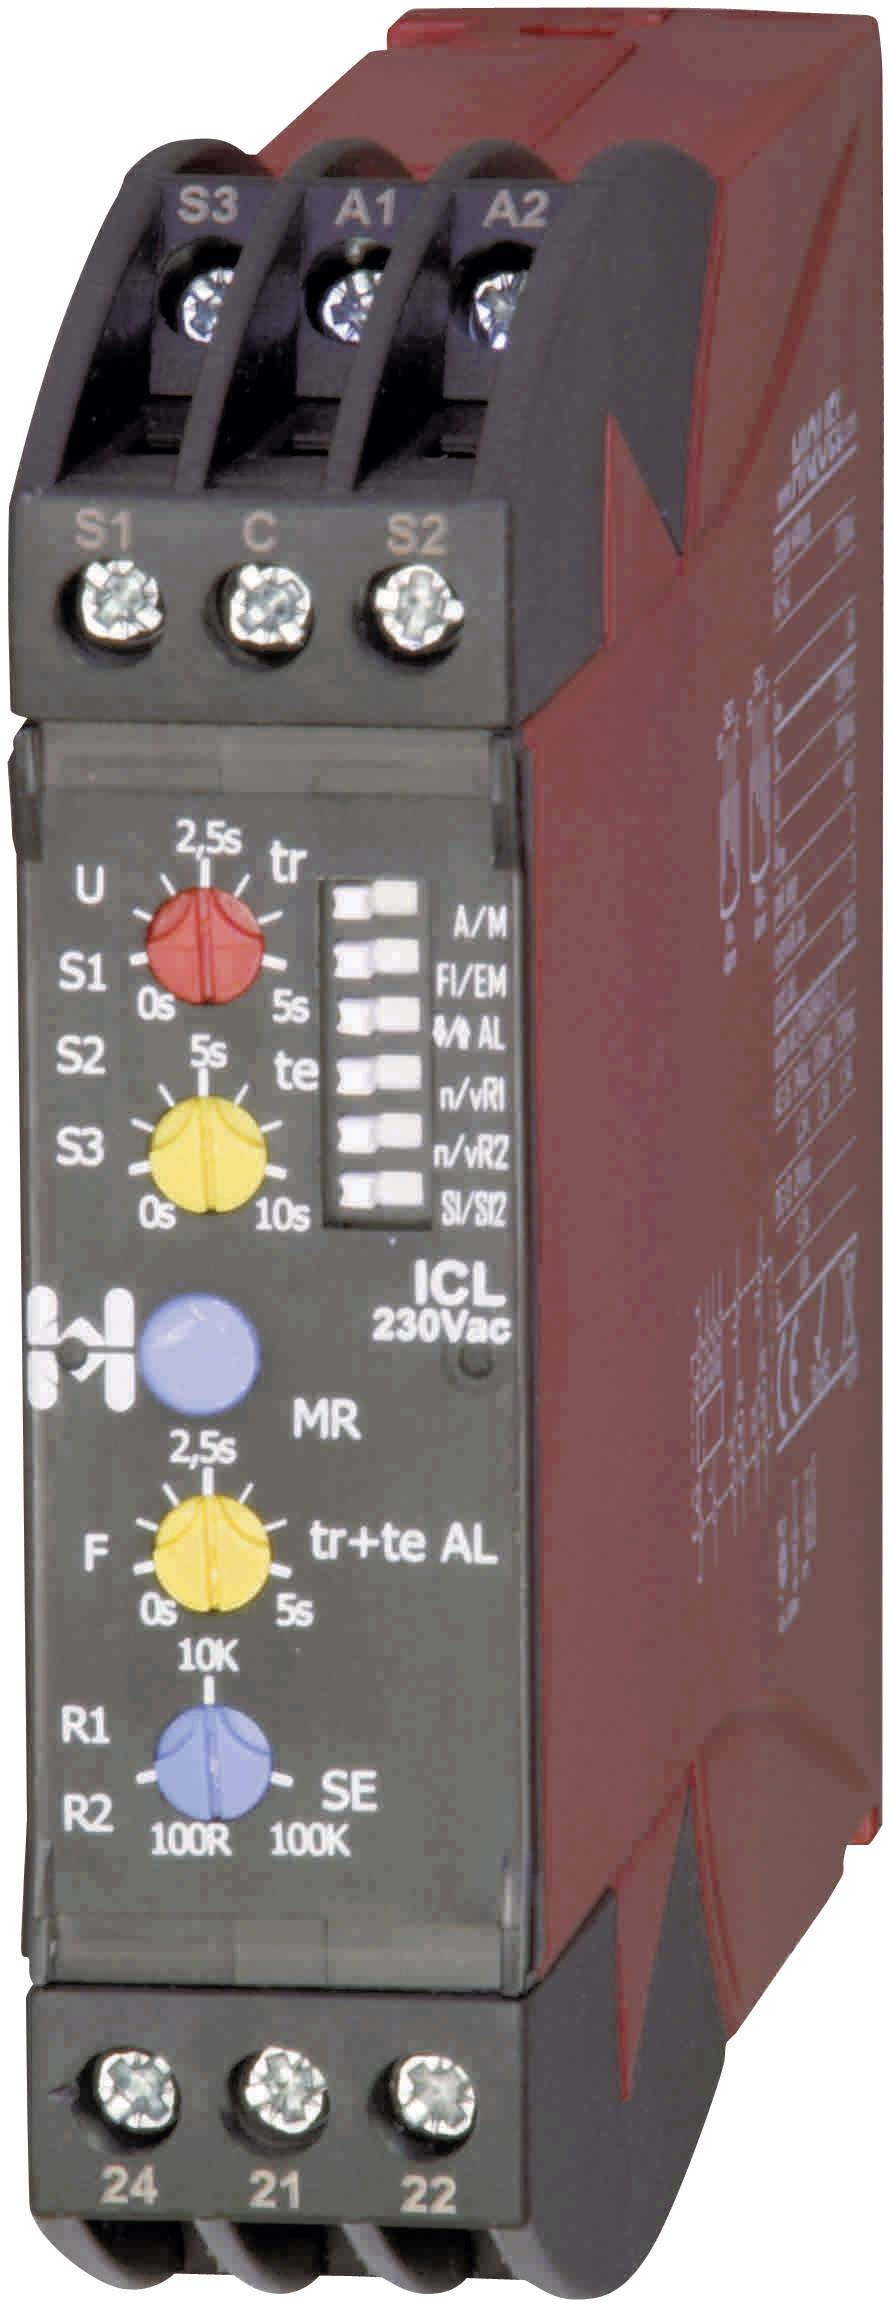 Kontrolné relé Hiquel ICL 24Vac ICL 24Vac